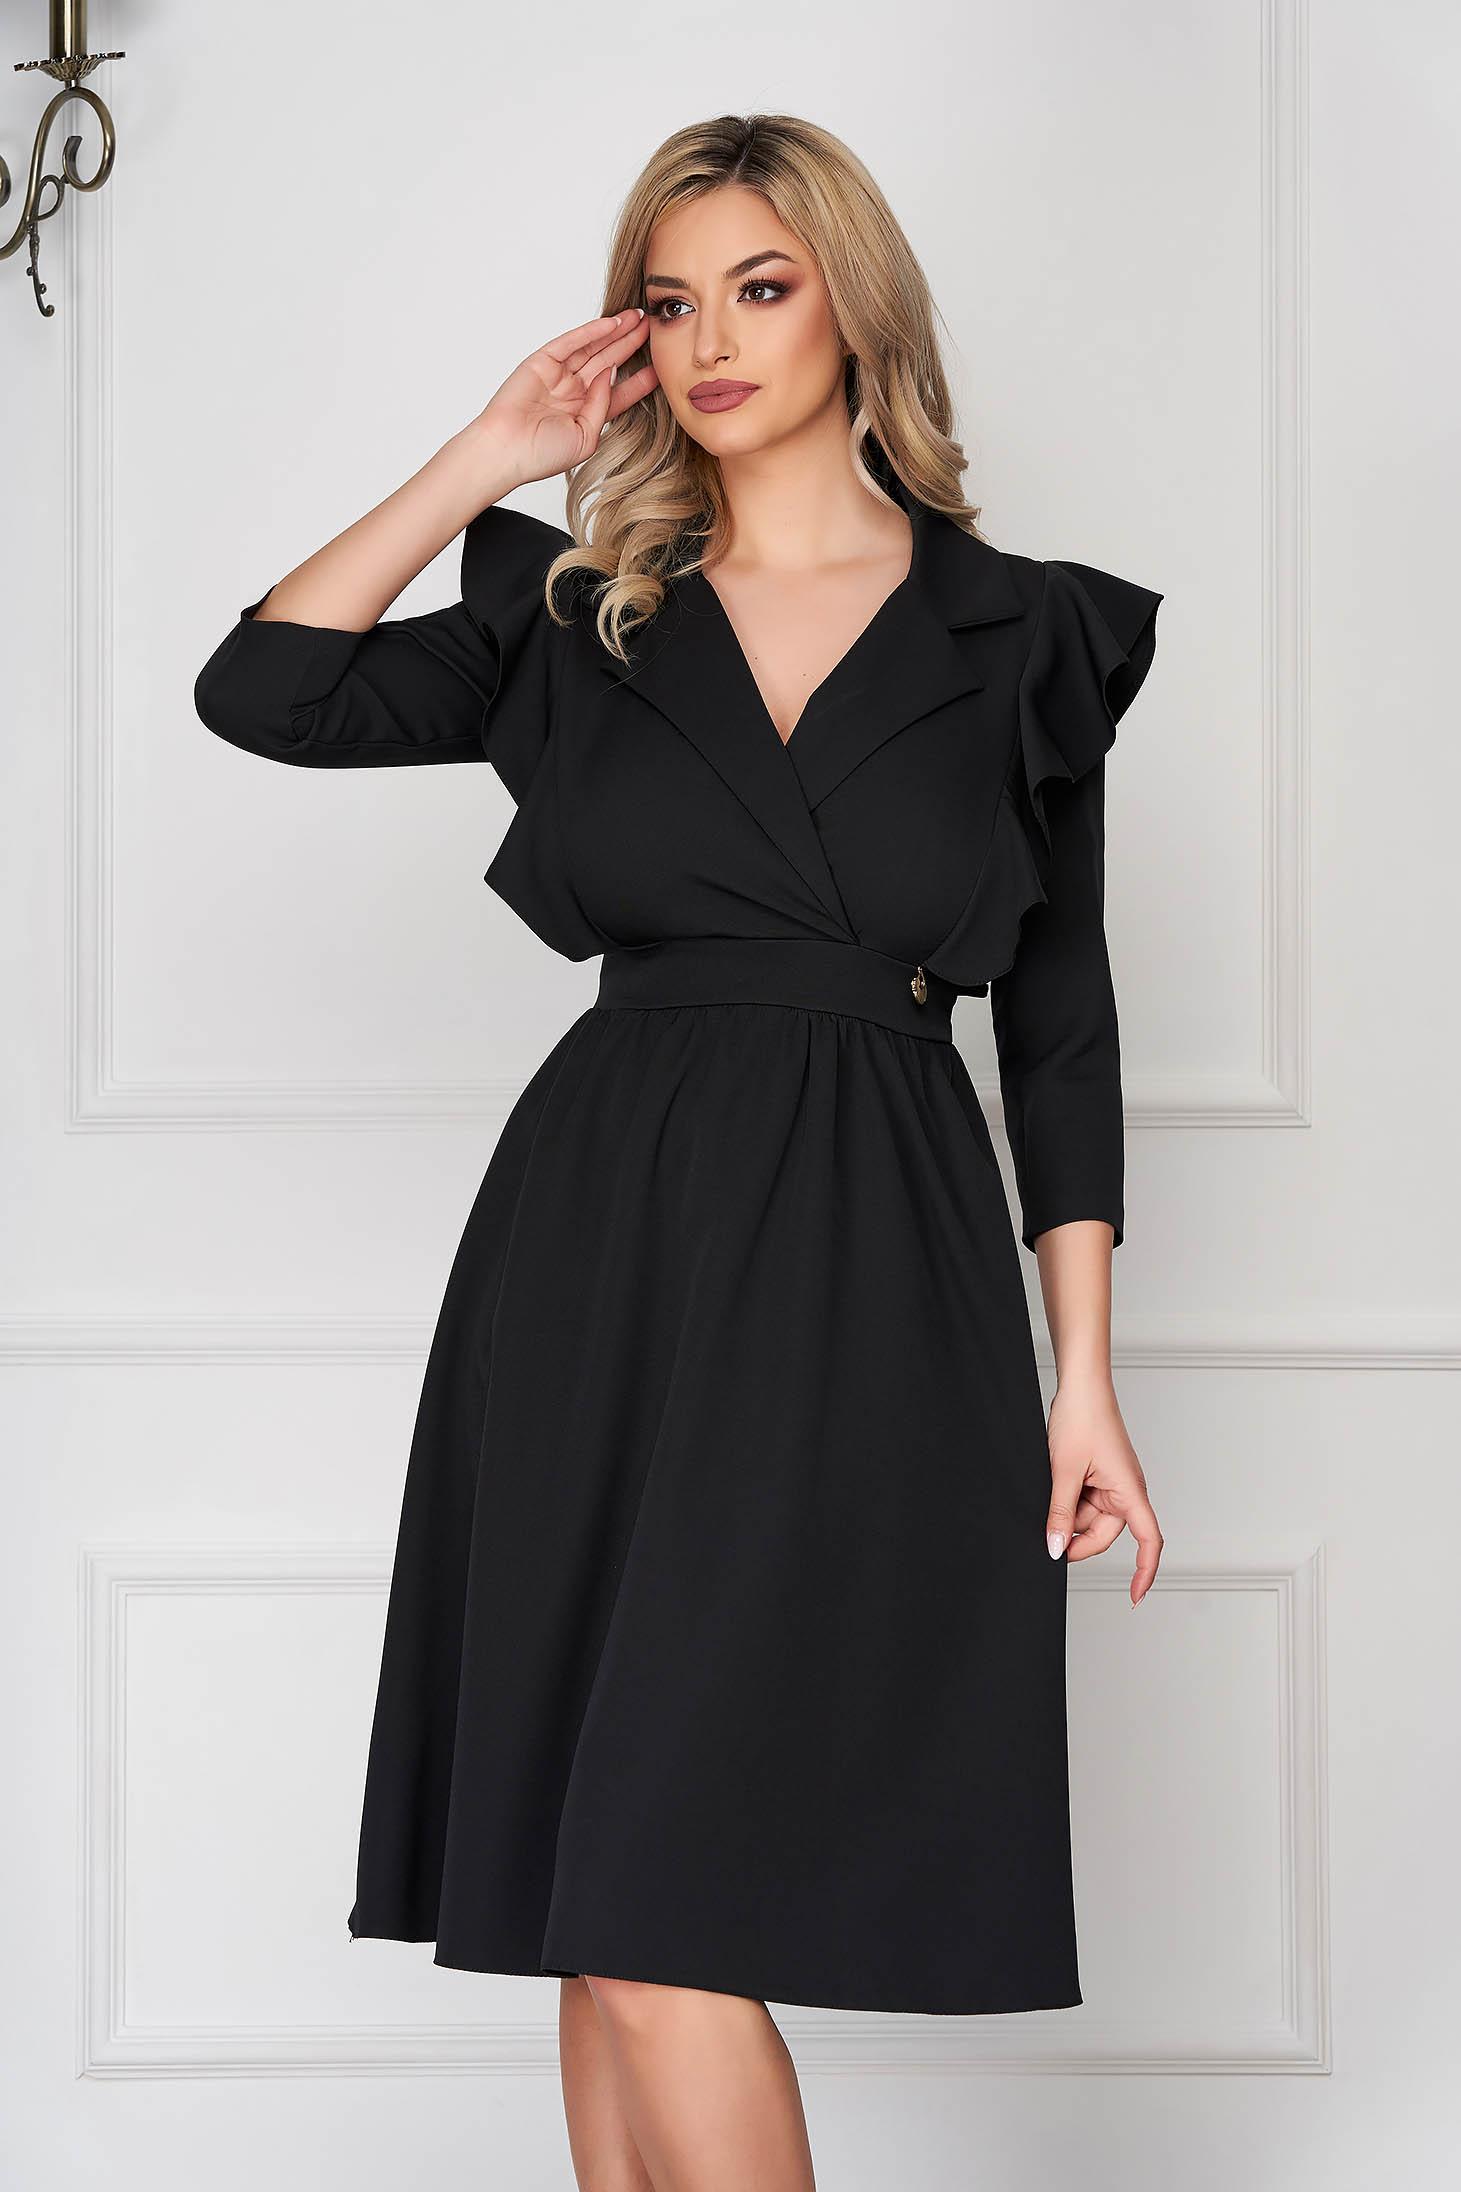 Black dress elegant midi cloche cloth thin fabric with ruffled sleeves